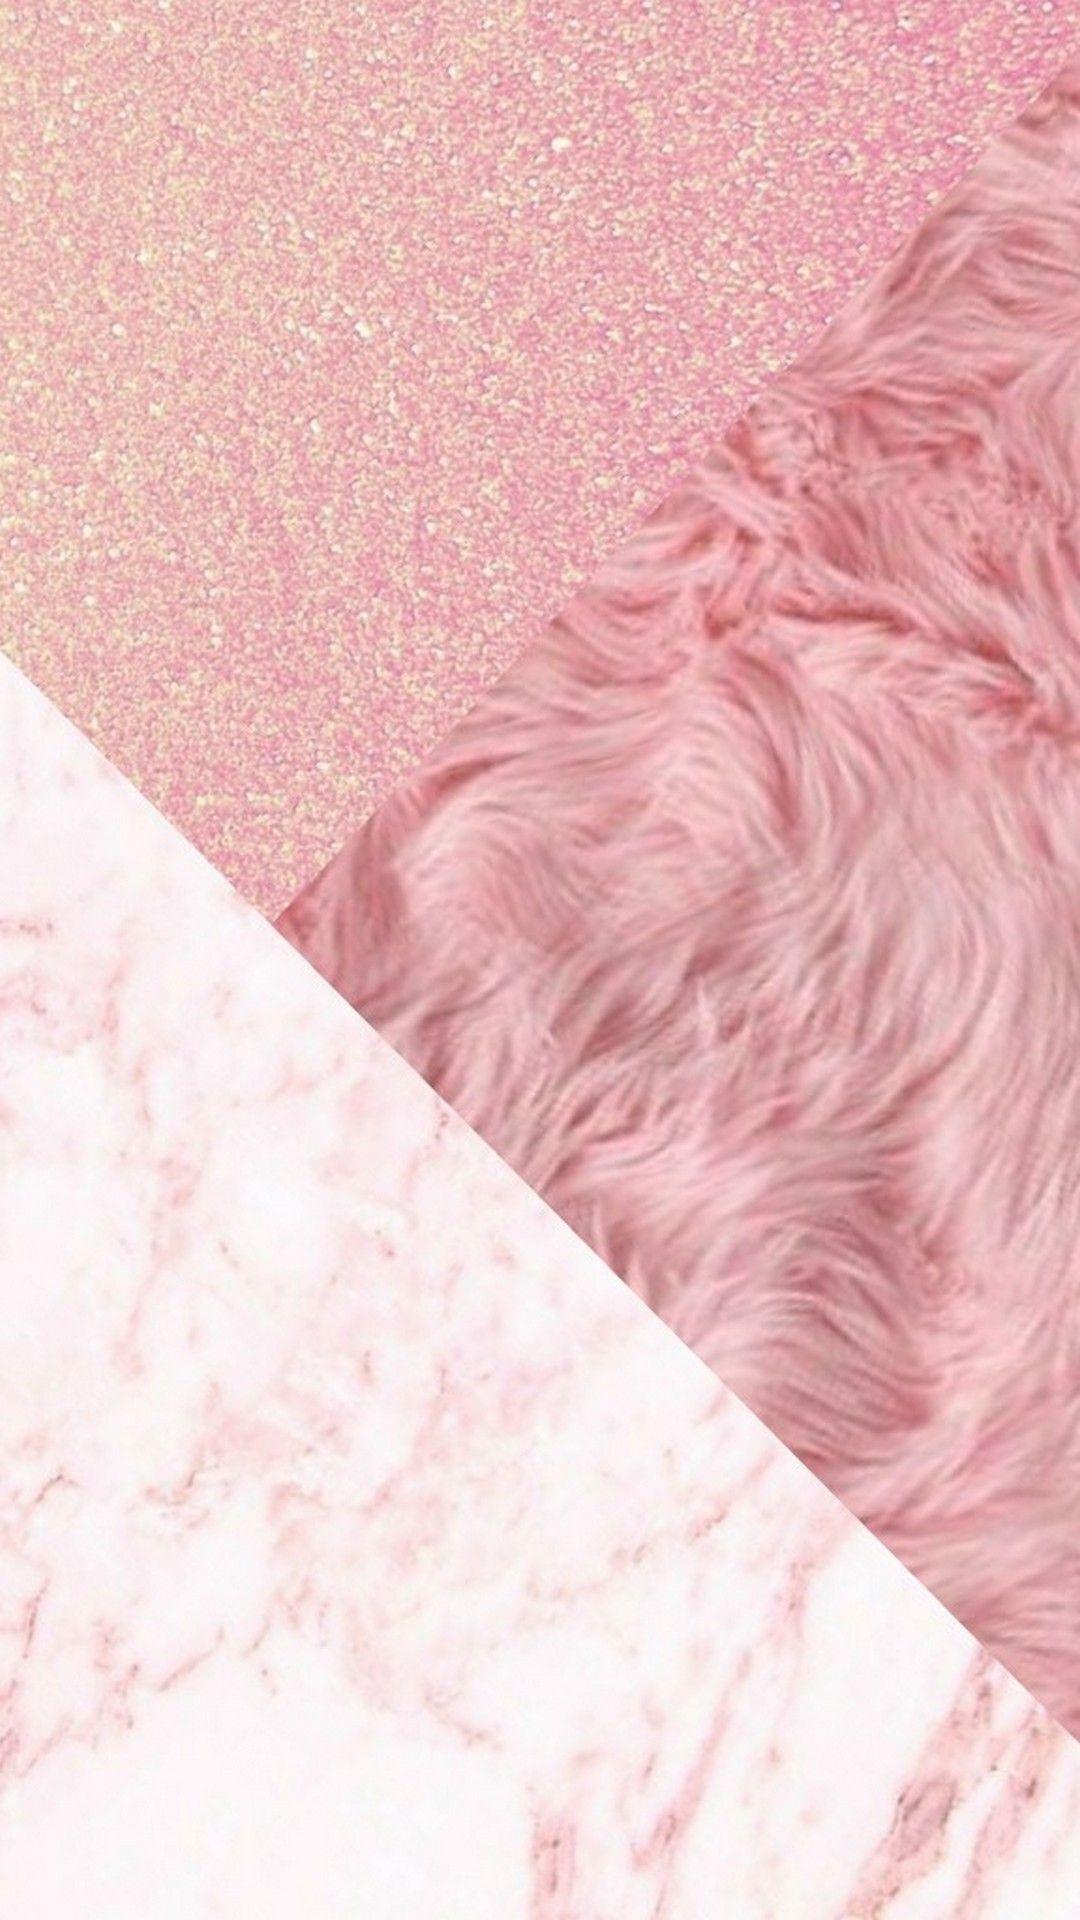 Classy Blush Pink Iphone Wallpaper HD Wallpaper in 2020